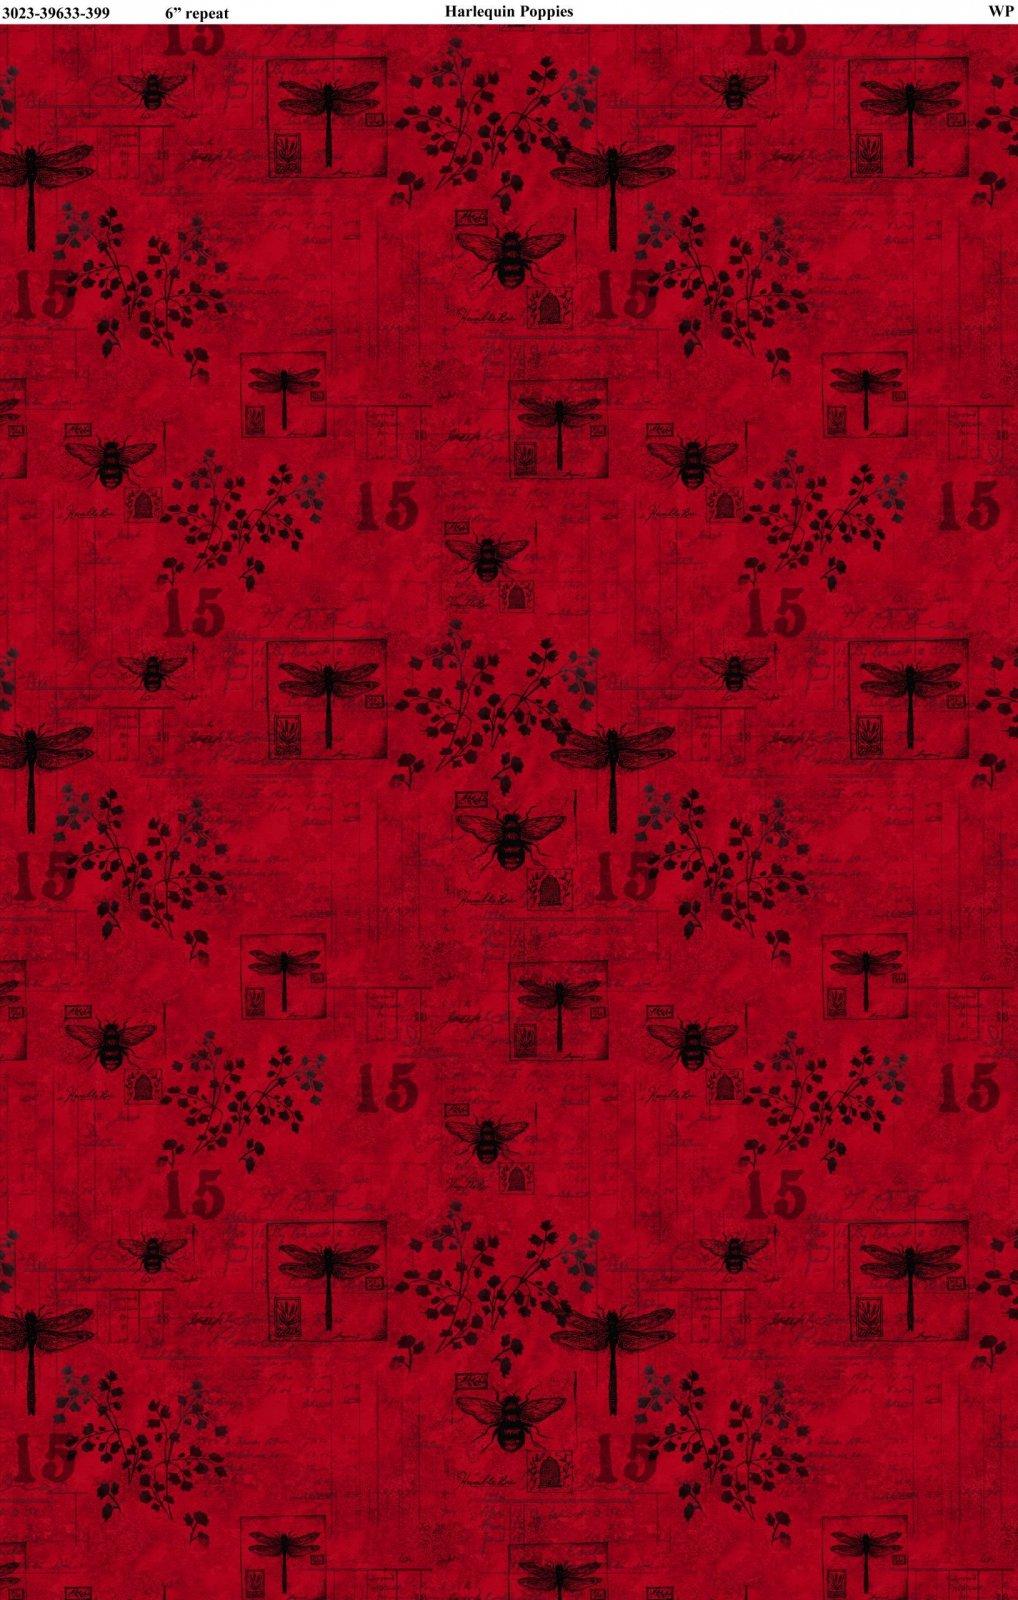 Harlequin Poppies - Red Garden Toile